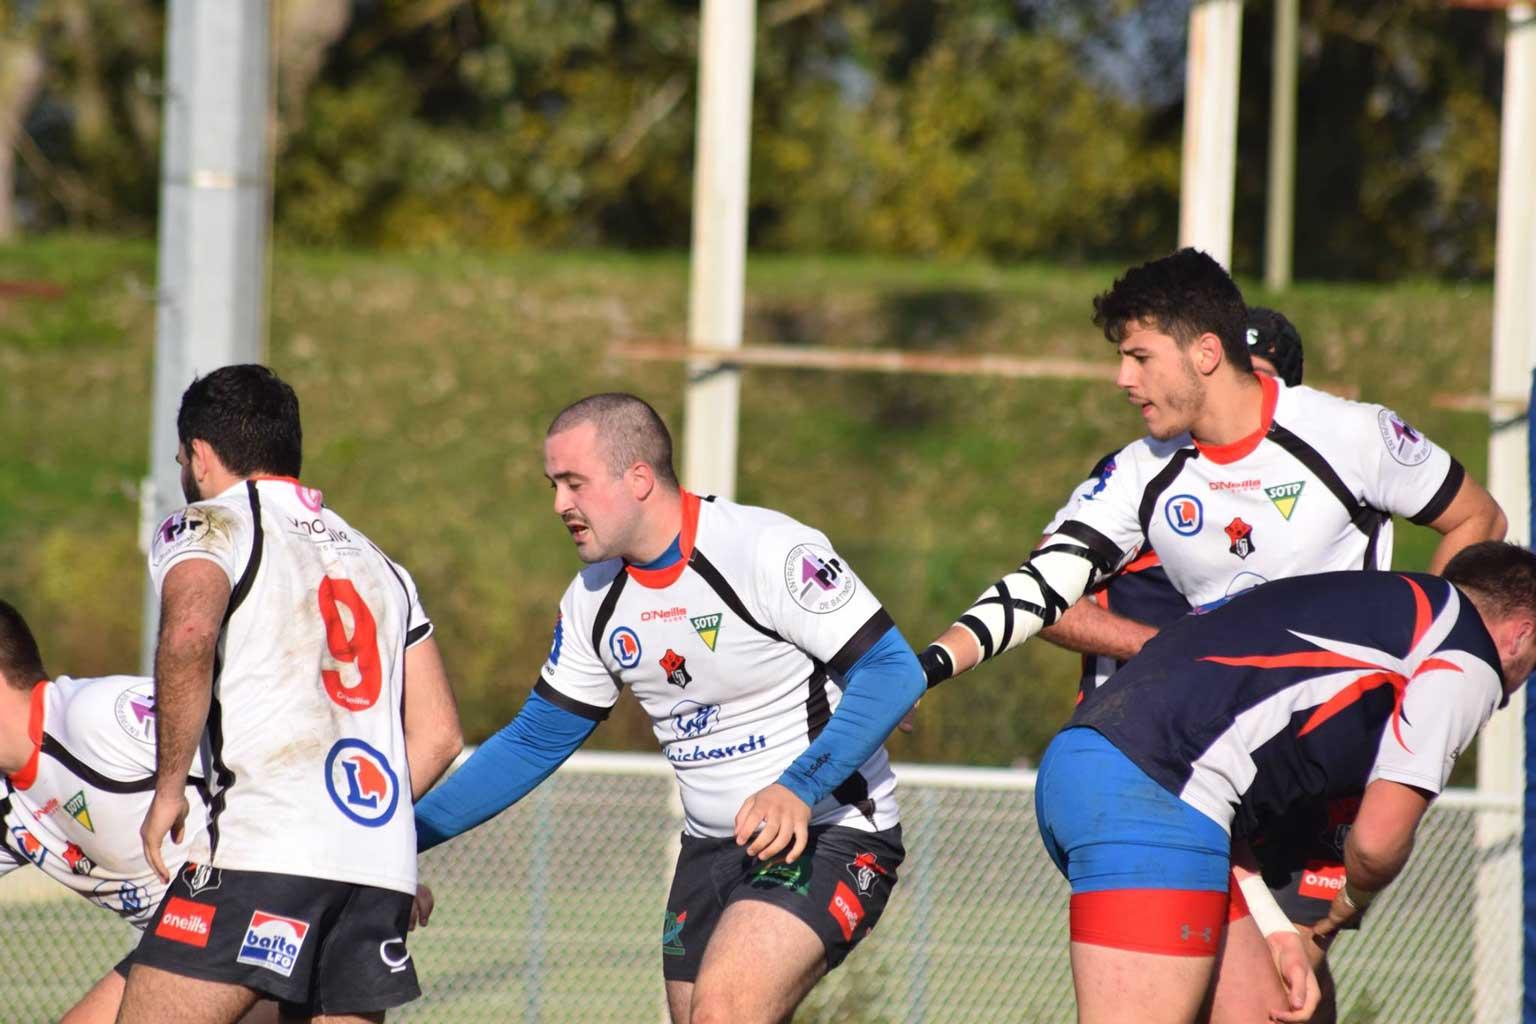 © 2018 Maeva Franco - Espoirs - Blagnac vs Graulhet - Photo 23